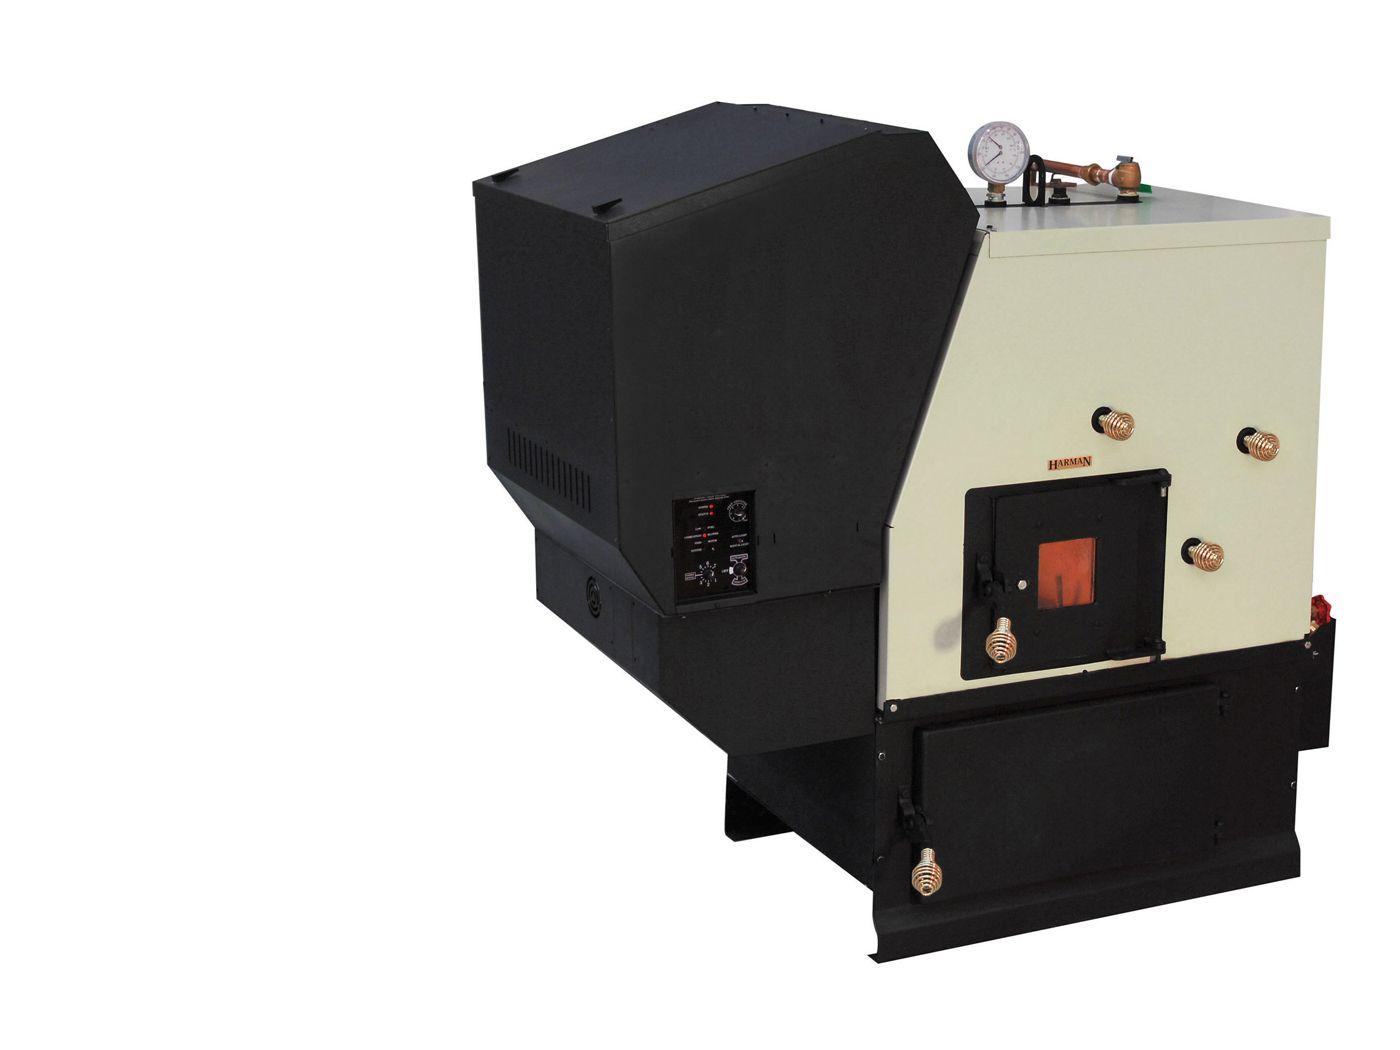 Harman Pb105 Pellet Boiler Boiler Pellet Heating And Cooling